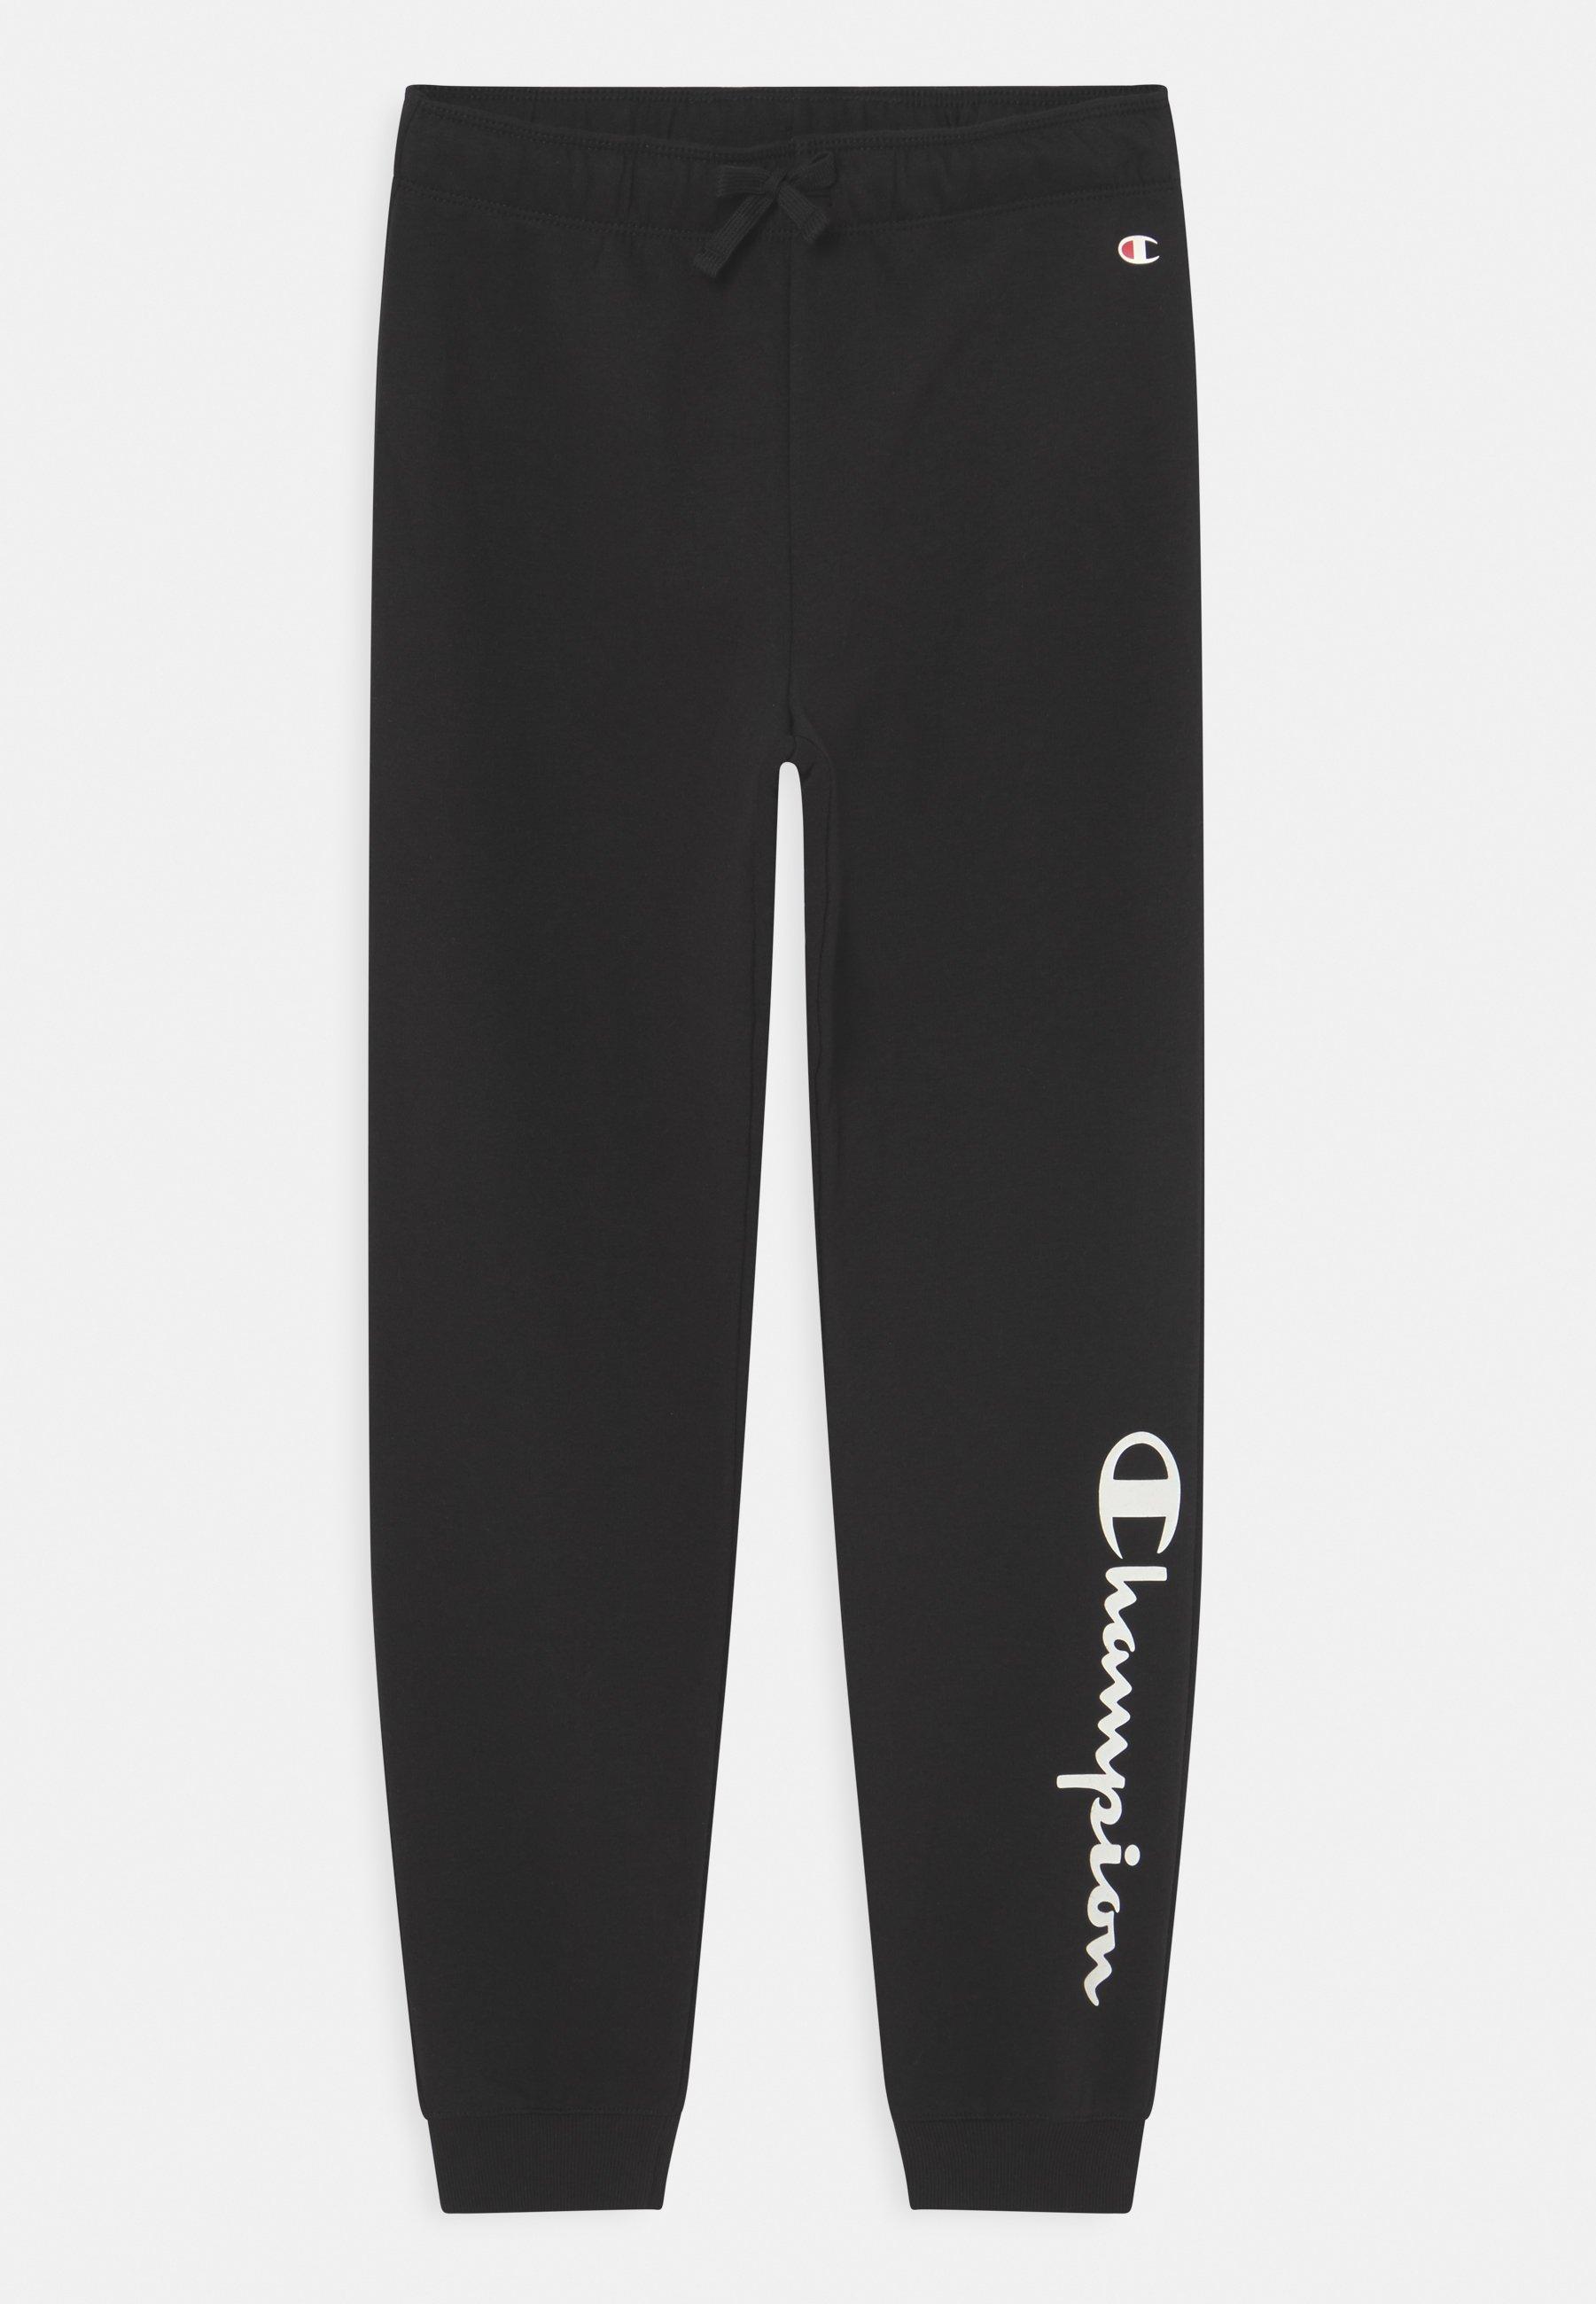 Bambini AMERICAN CLASSICS CUFF UNISEX - Pantaloni sportivi